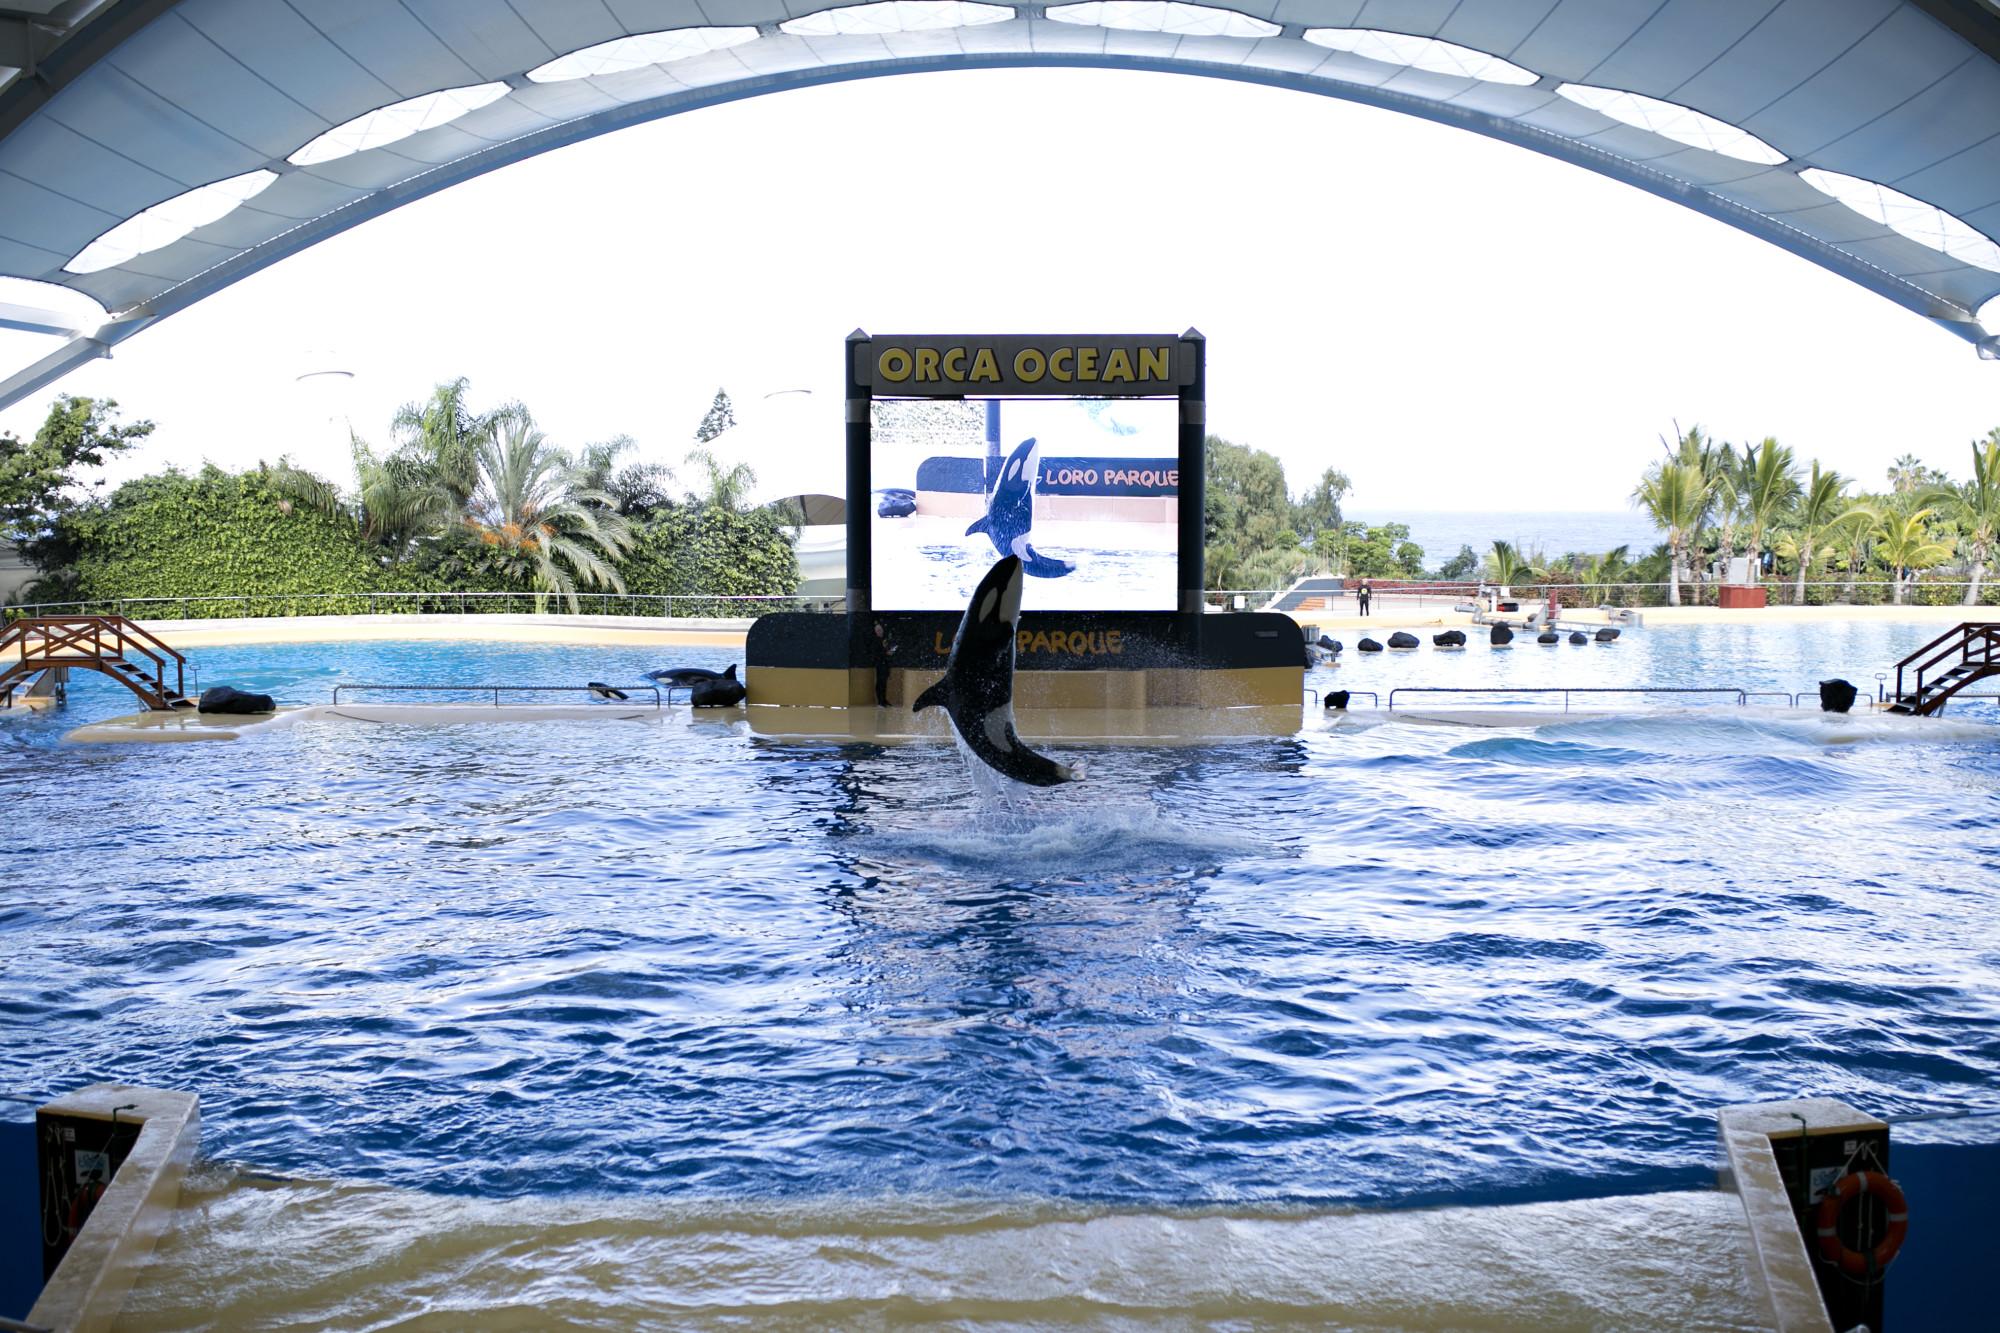 teneryfa, tenerife, loro park, orca